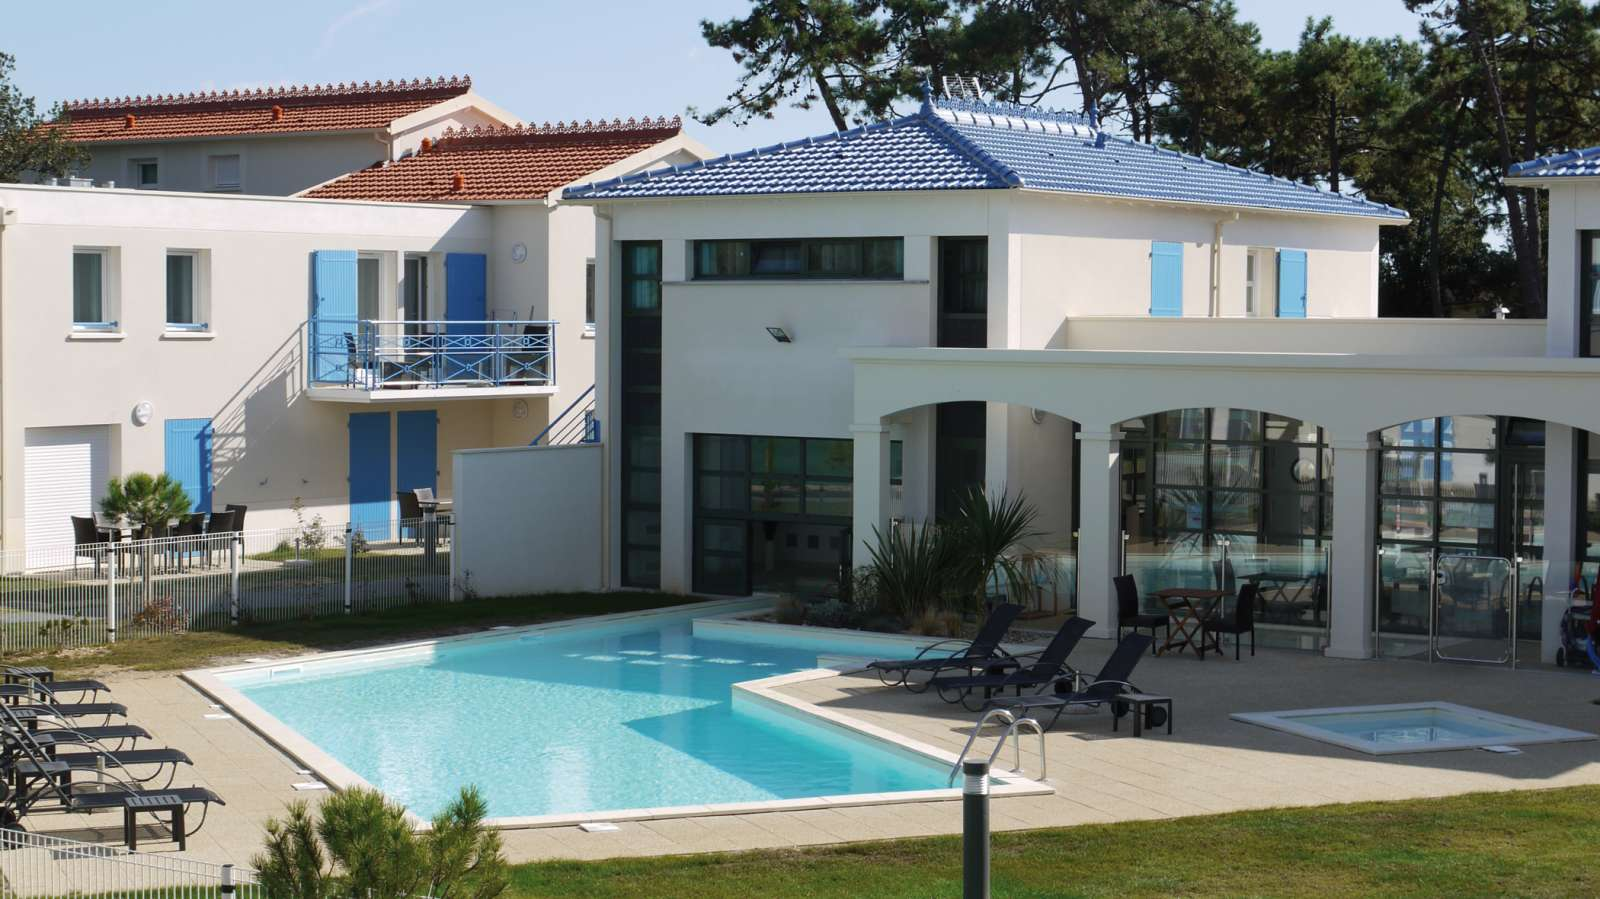 residence les carrelets holiday accommodation saint palais sur mer lagrange. Black Bedroom Furniture Sets. Home Design Ideas